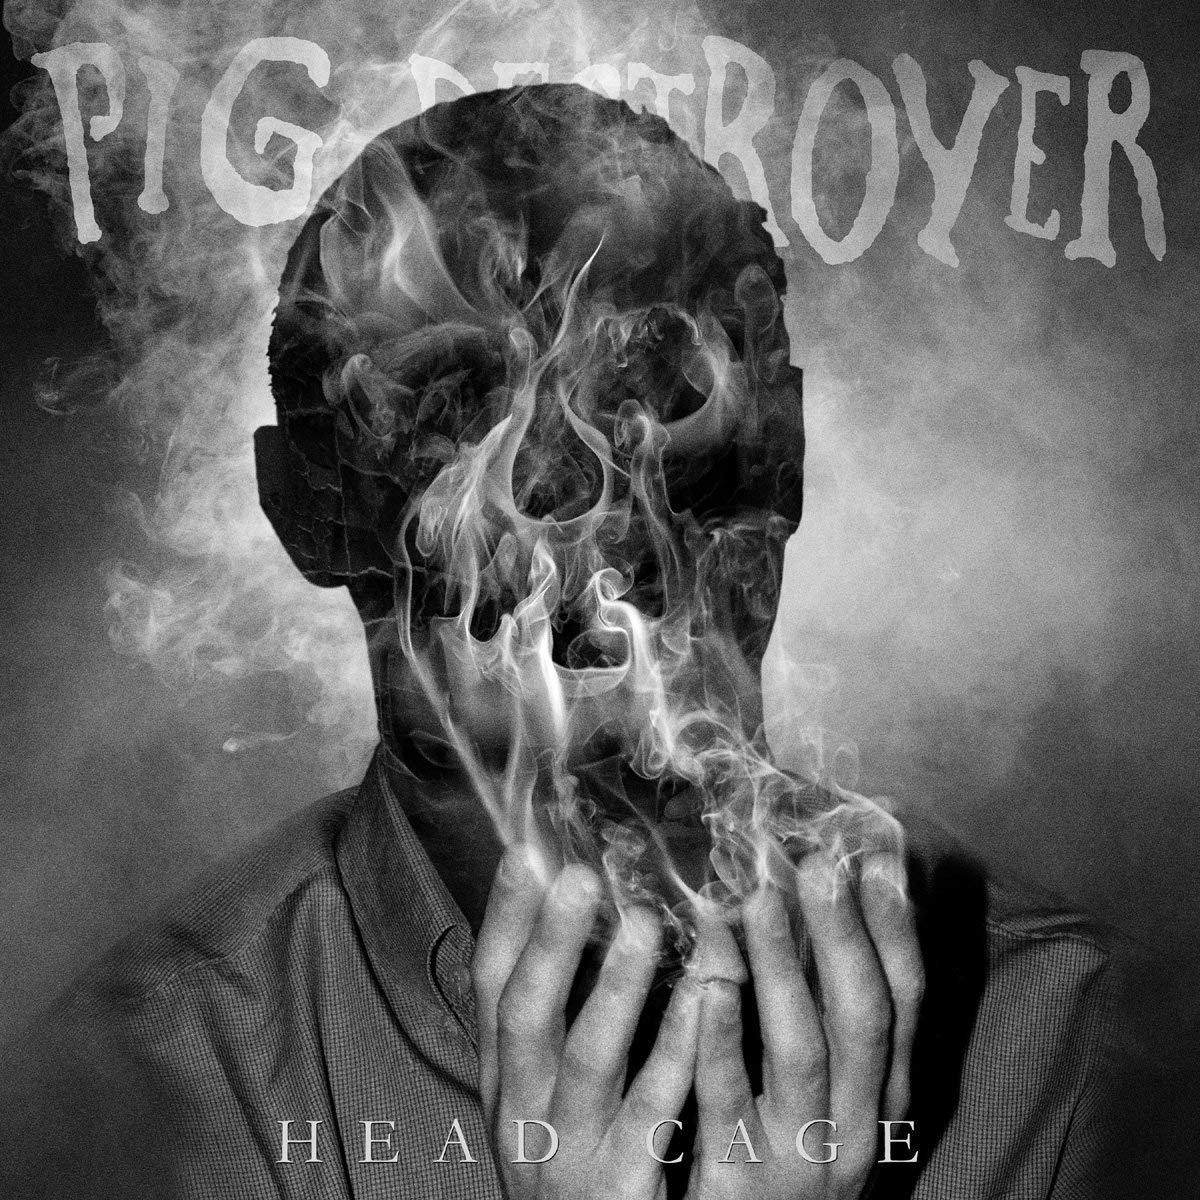 Vinilo : Pig Destroyer - Head Cage (LP Vinyl)